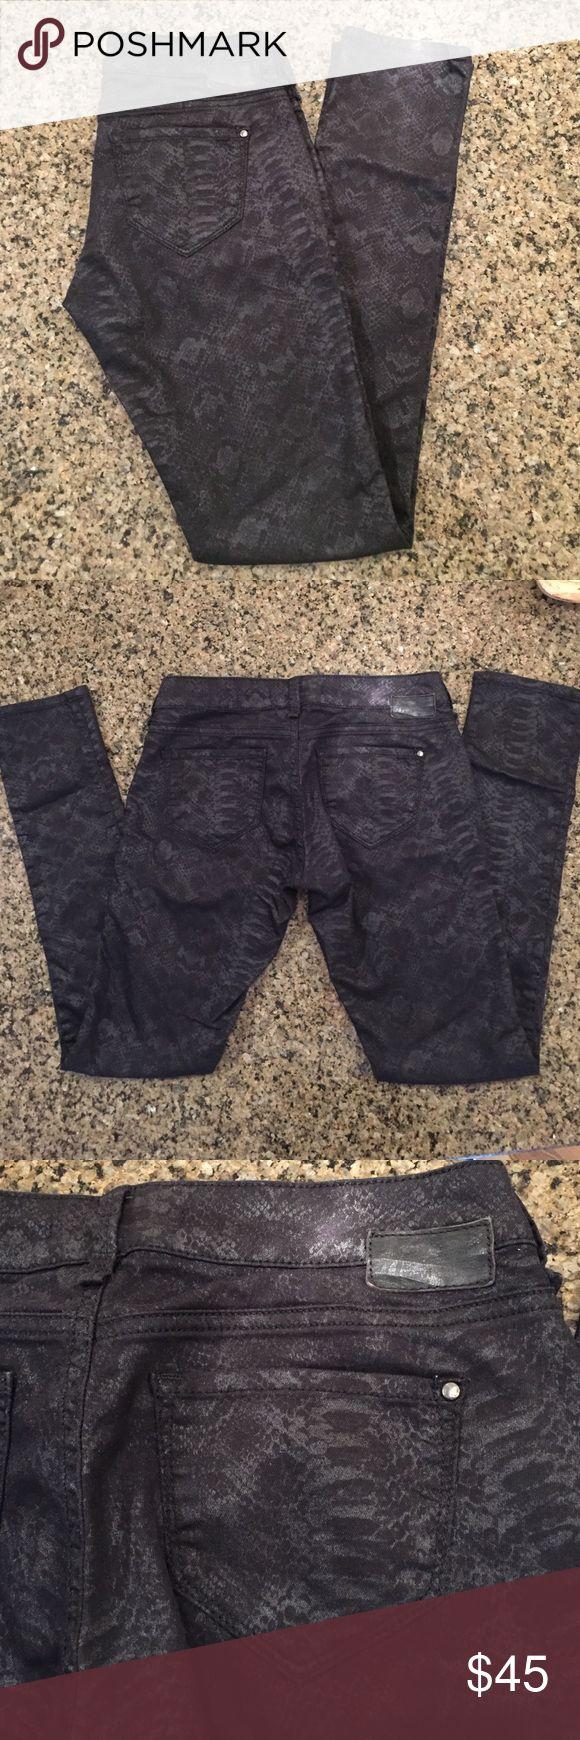 "MAVI Serena Low Rise Super Skinny Jeans Black snakeskin print denim.  Serena, low rise, super skinny jeans.  89% Cotton, 29% End, 2% Elastine.  Size 26.  Inseam 30"" Mavi Jeans Skinny"